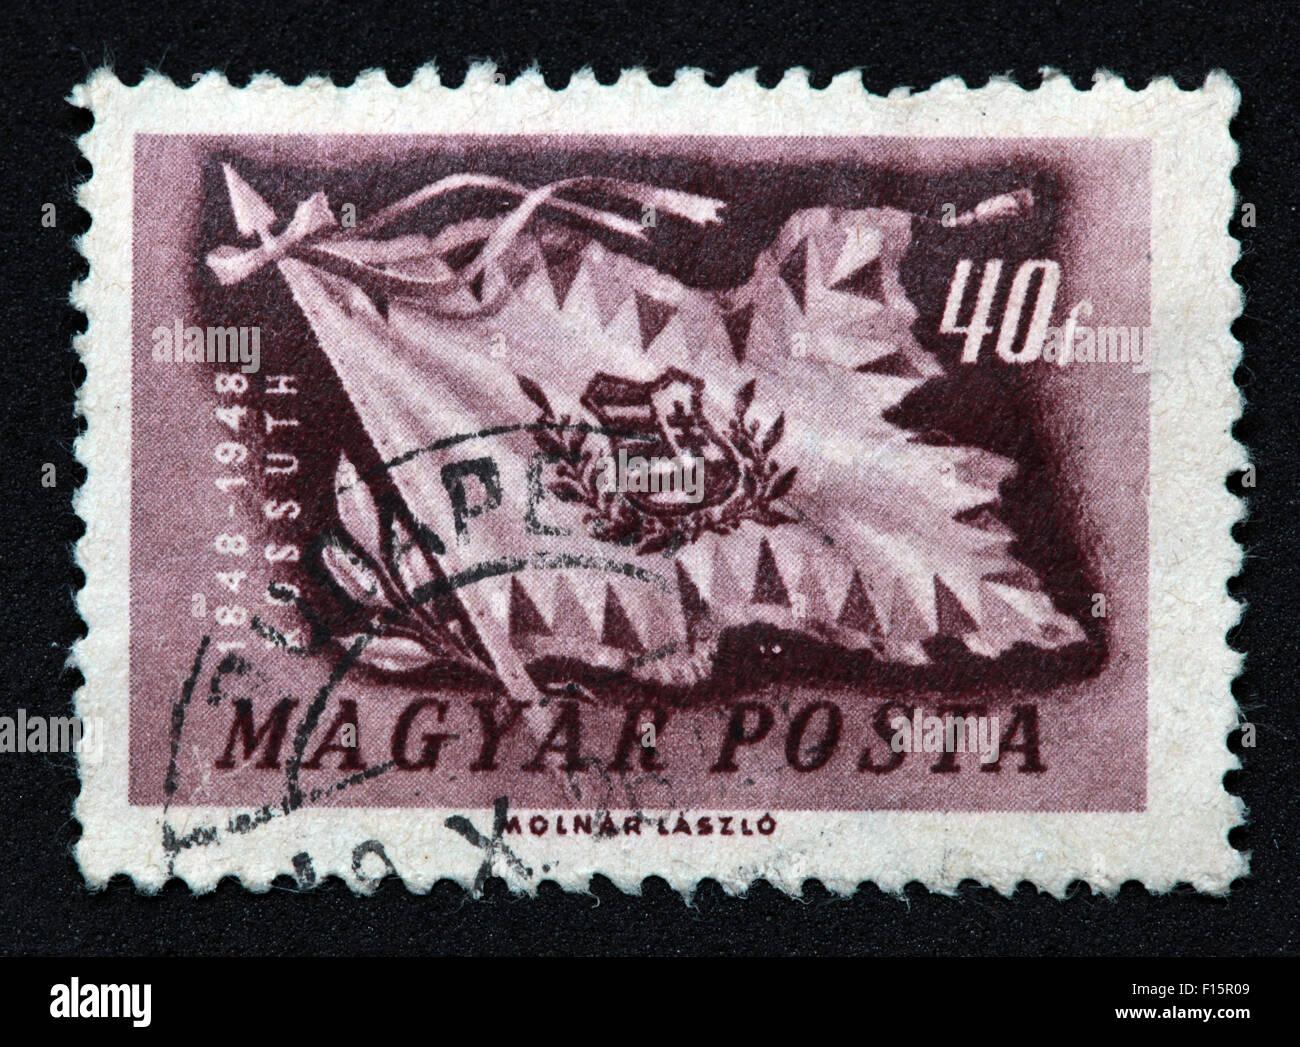 Magyar Posta 1848 1948 1848-1948 40f purple lilac Kossuth Flag Molnar Laszlo stamp - Stock Image